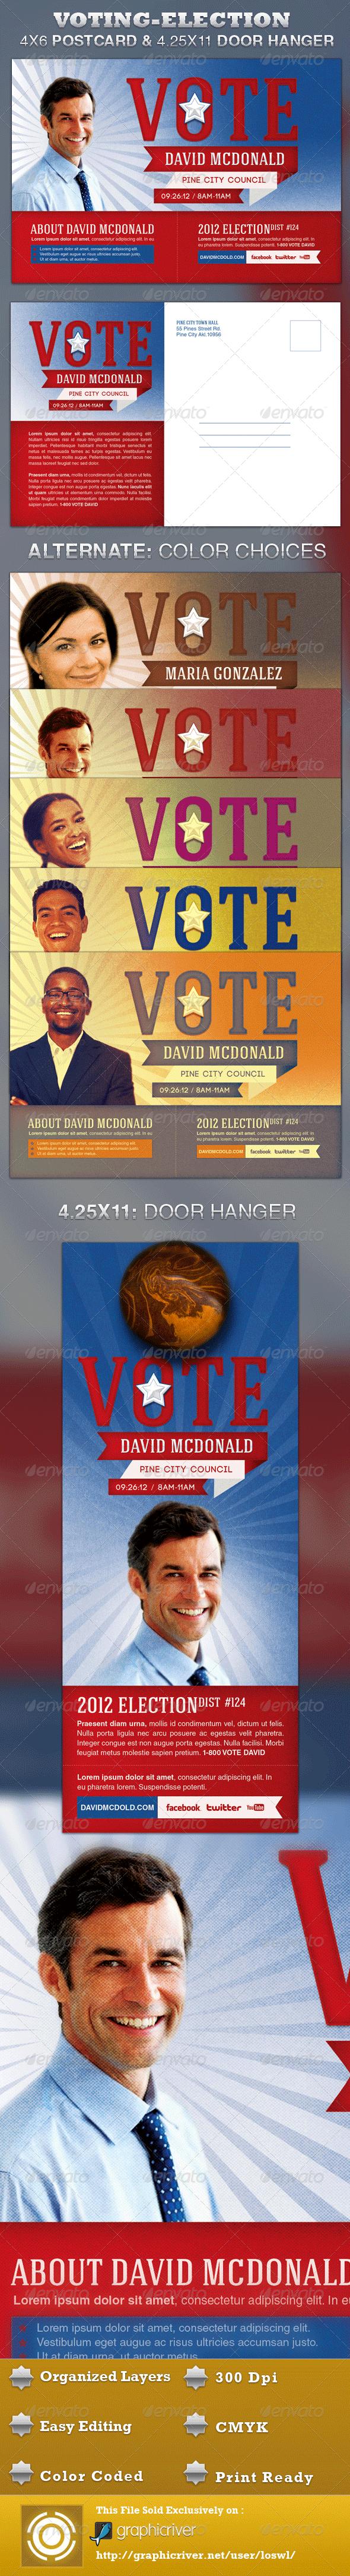 Voting-Election Postcard and Door Hanger Template - Events Flyers